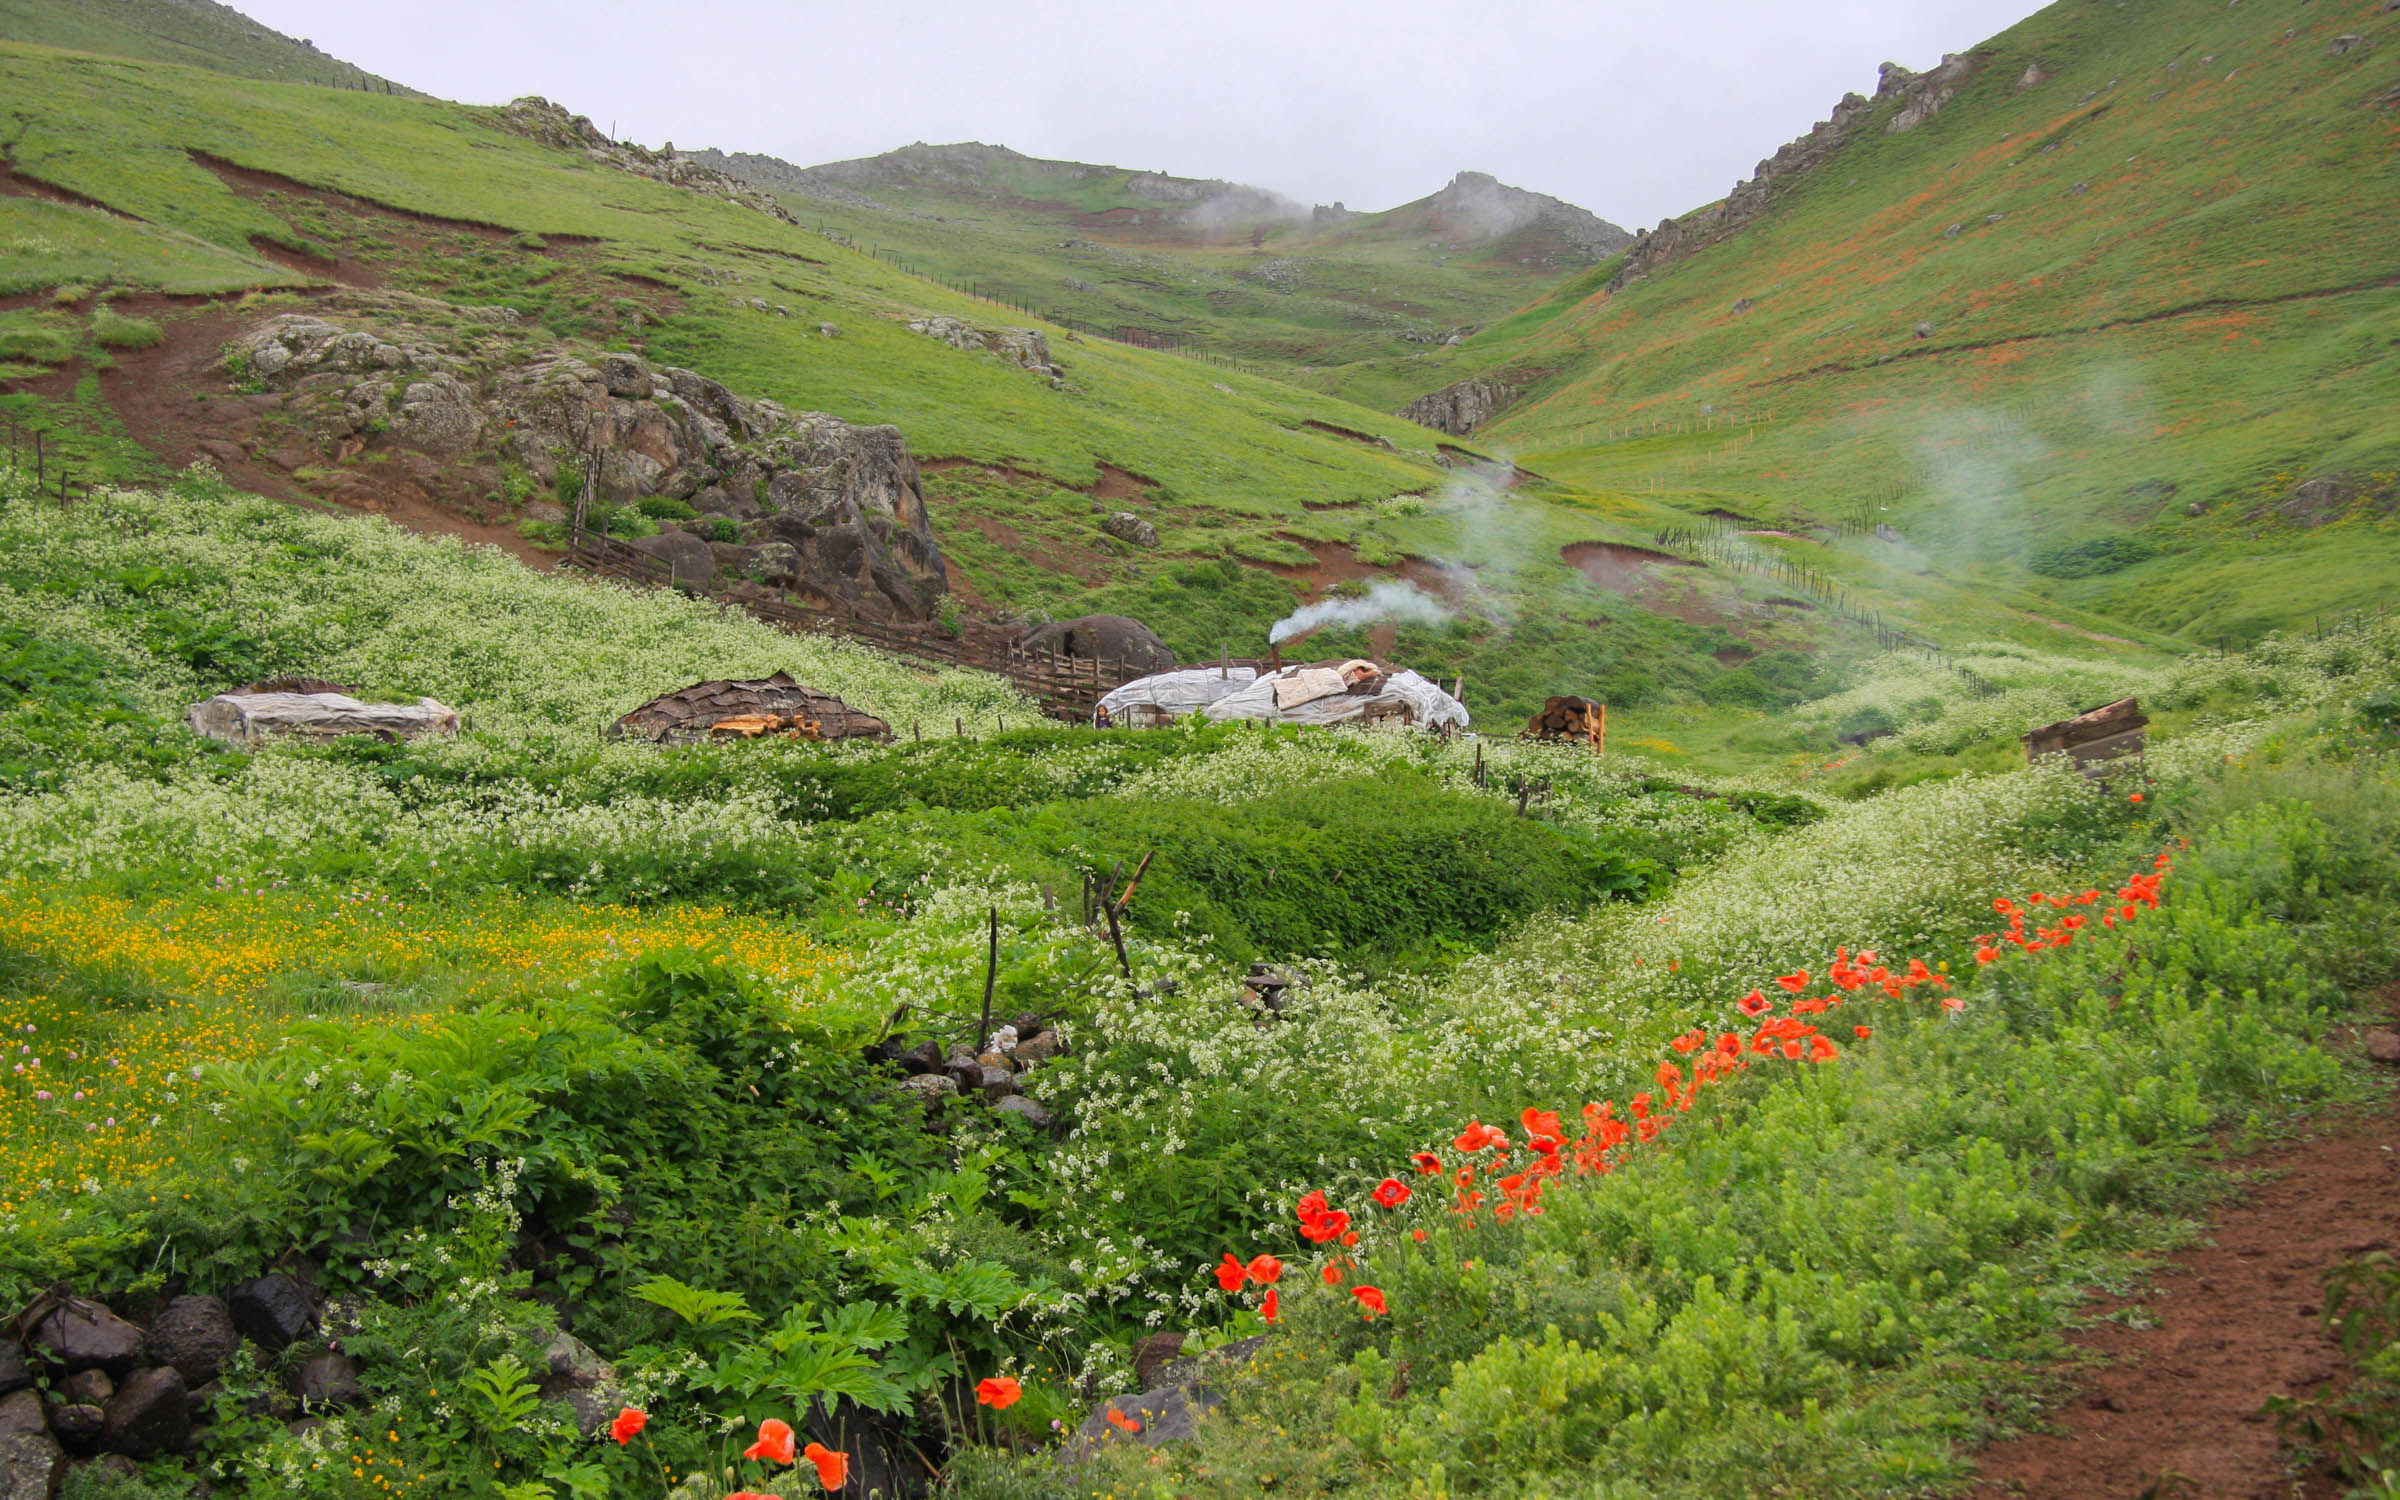 Trekking in Iran hinterland